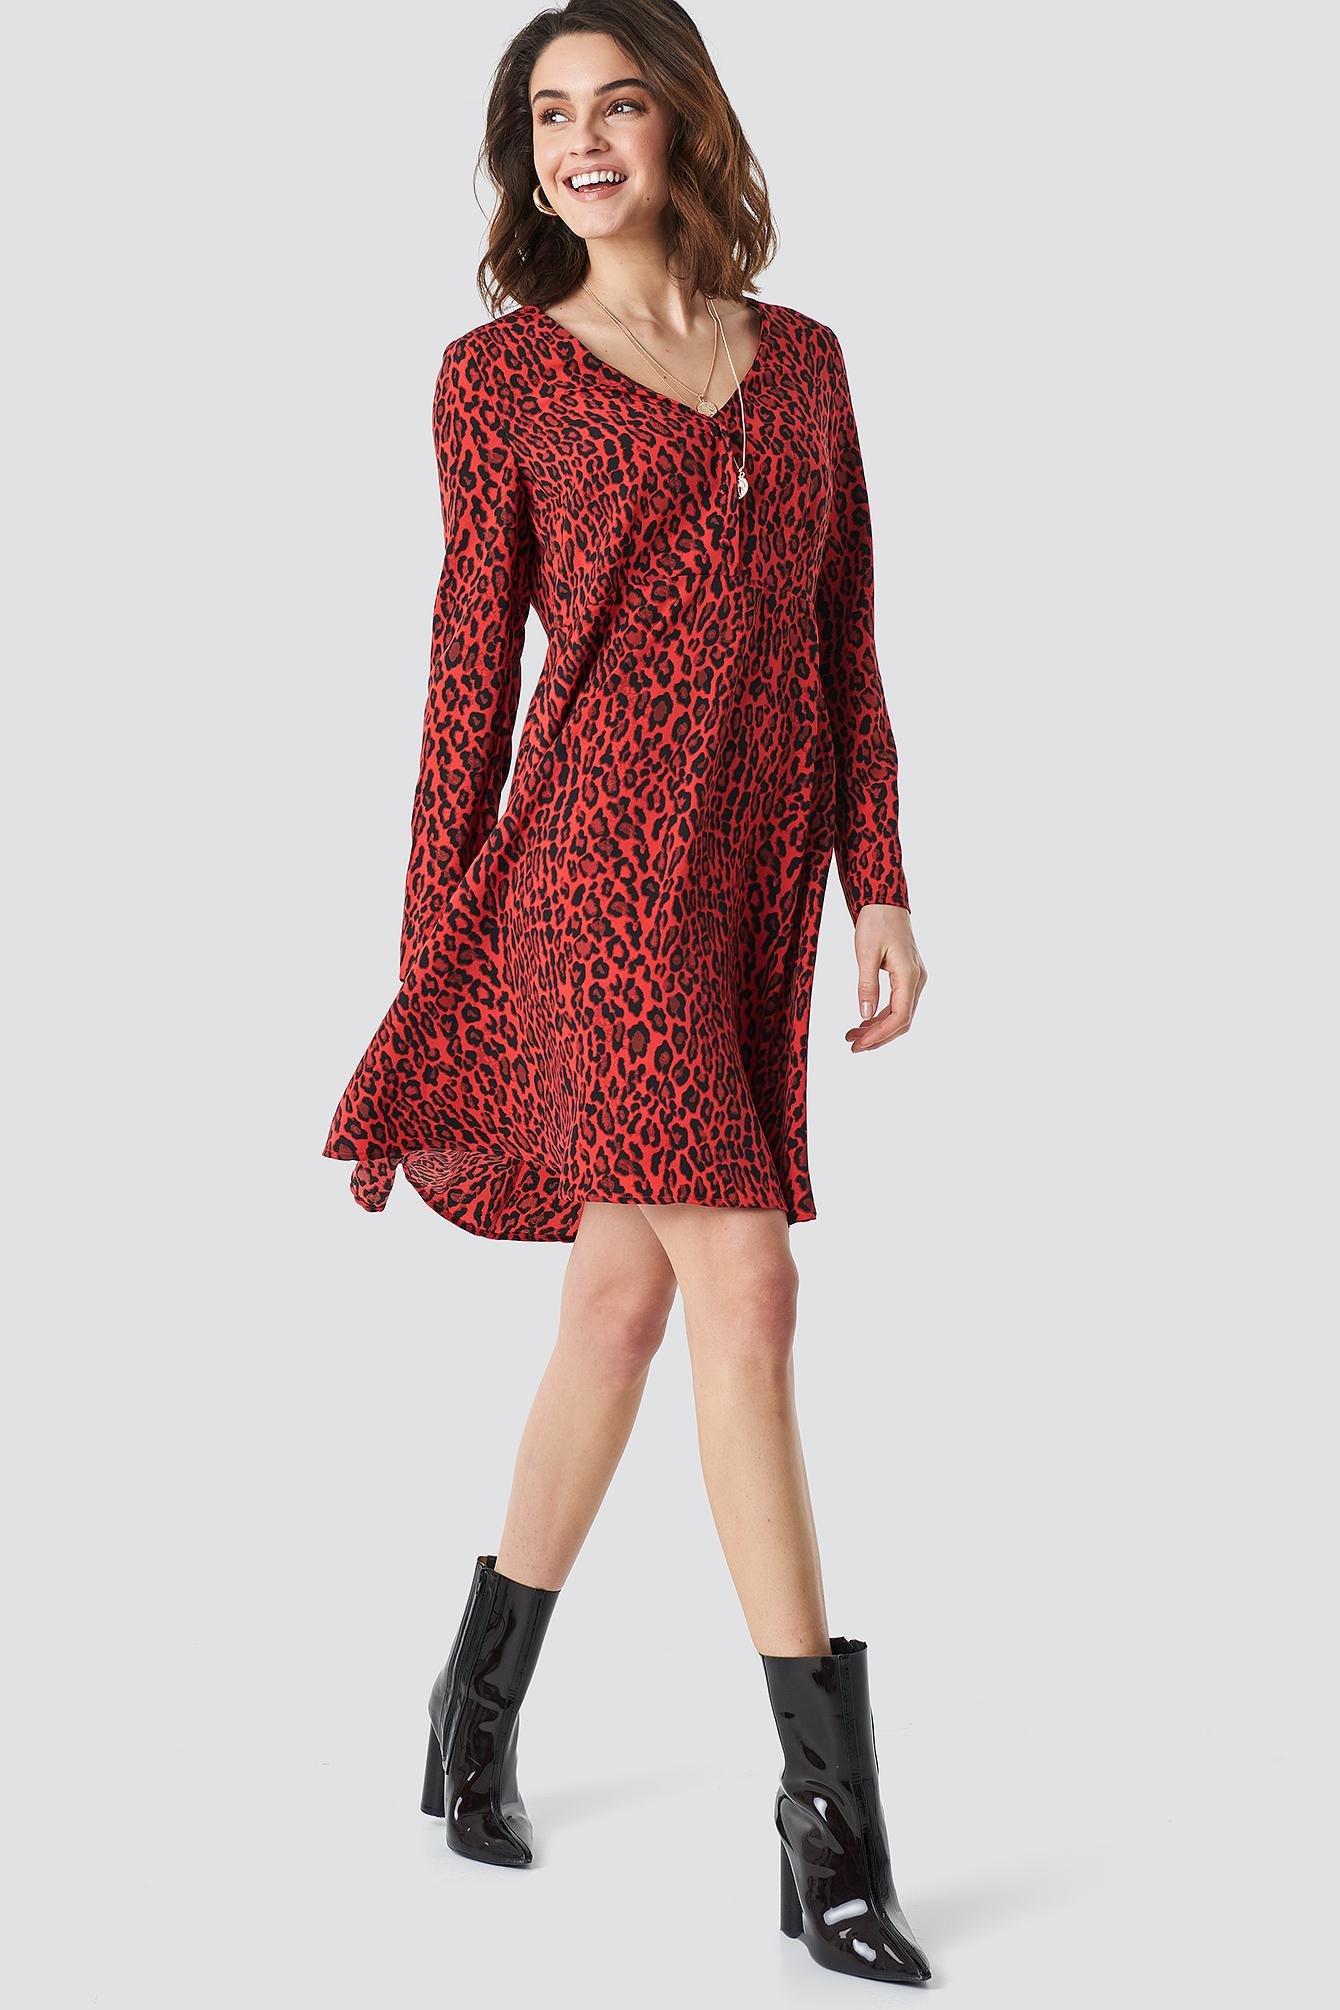 the best attitude 9572e f36a8 NA-KD. Women s Leopard Print Button Up Ls Dress ...